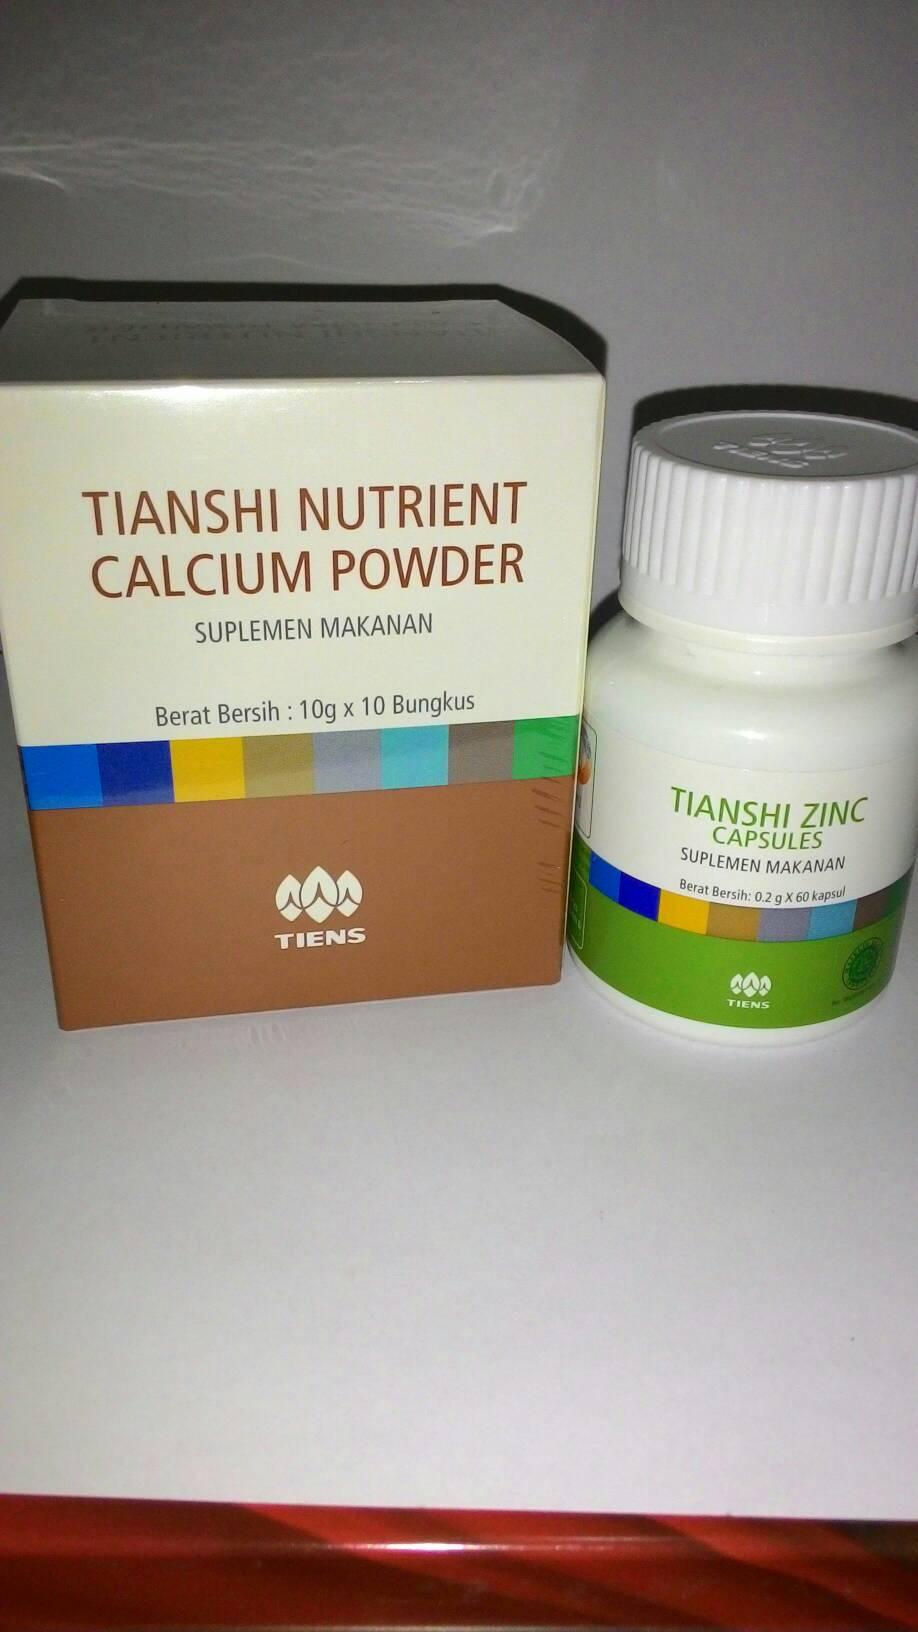 Jual Peninggi Badan Tiens Paket 20hari Nhcp Susu Kalsium Dan Zinc Original 2box 1botol Termurah Wellymajesty Tokopedia